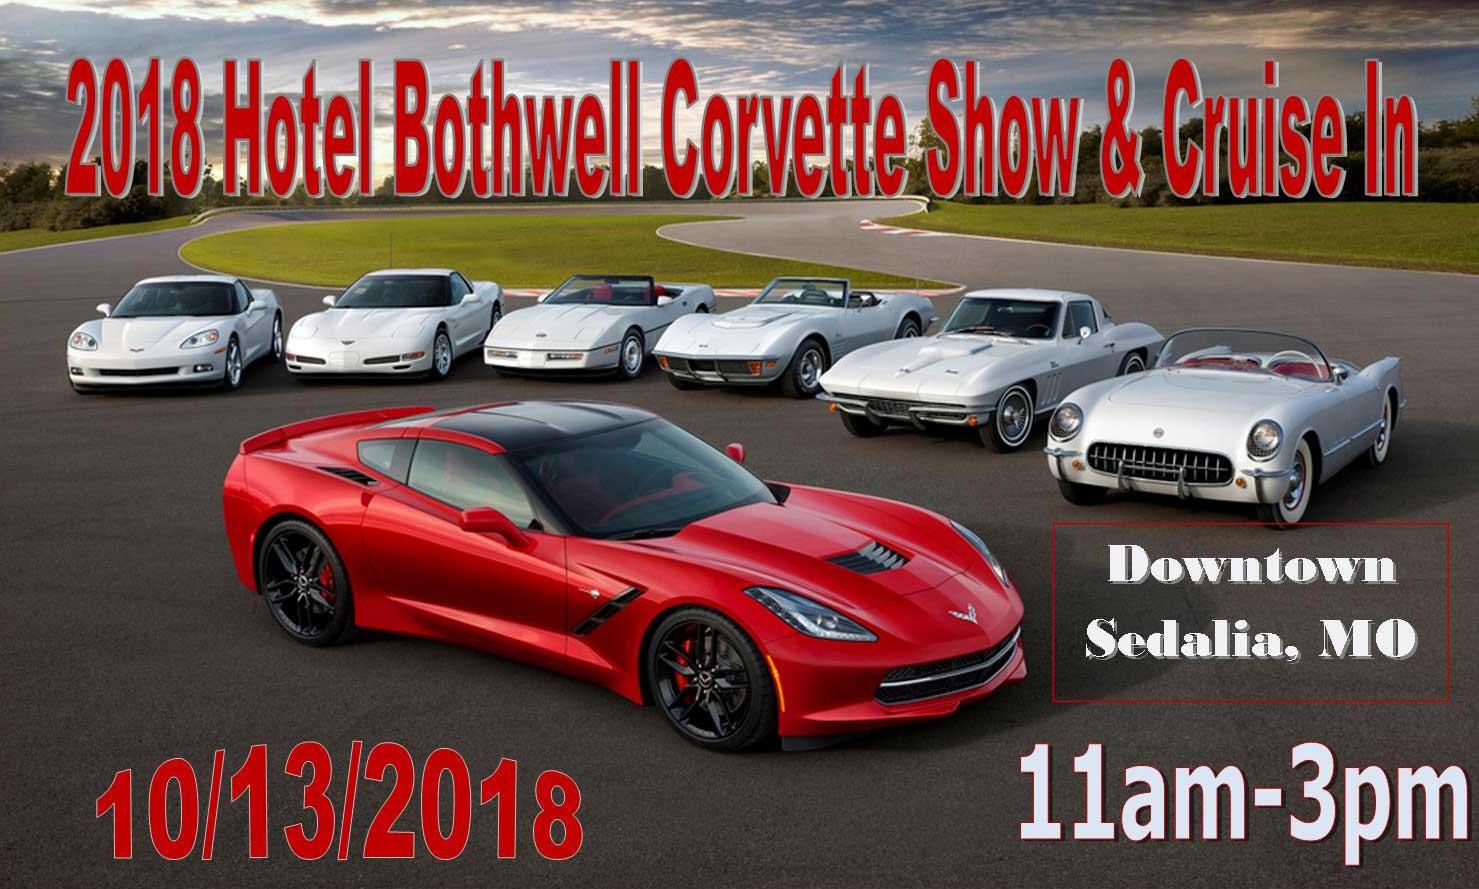 Hotel Bothwell Corvette Show And CruiseIn MidWest Corvettes Inc - Car show sedalia mo